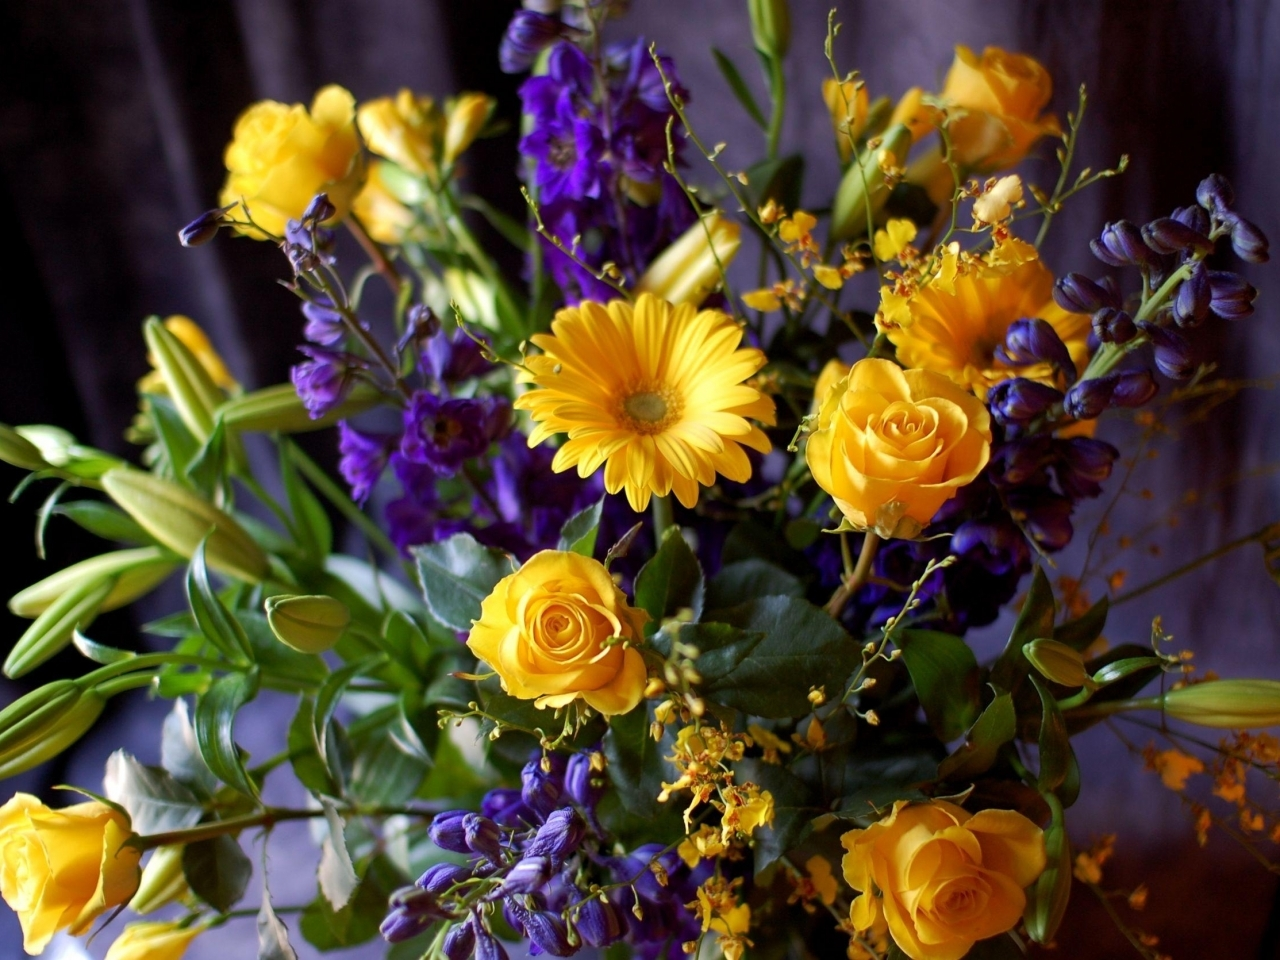 15749 descargar fondo de pantalla Plantas, Flores, Bouquets: protectores de pantalla e imágenes gratis